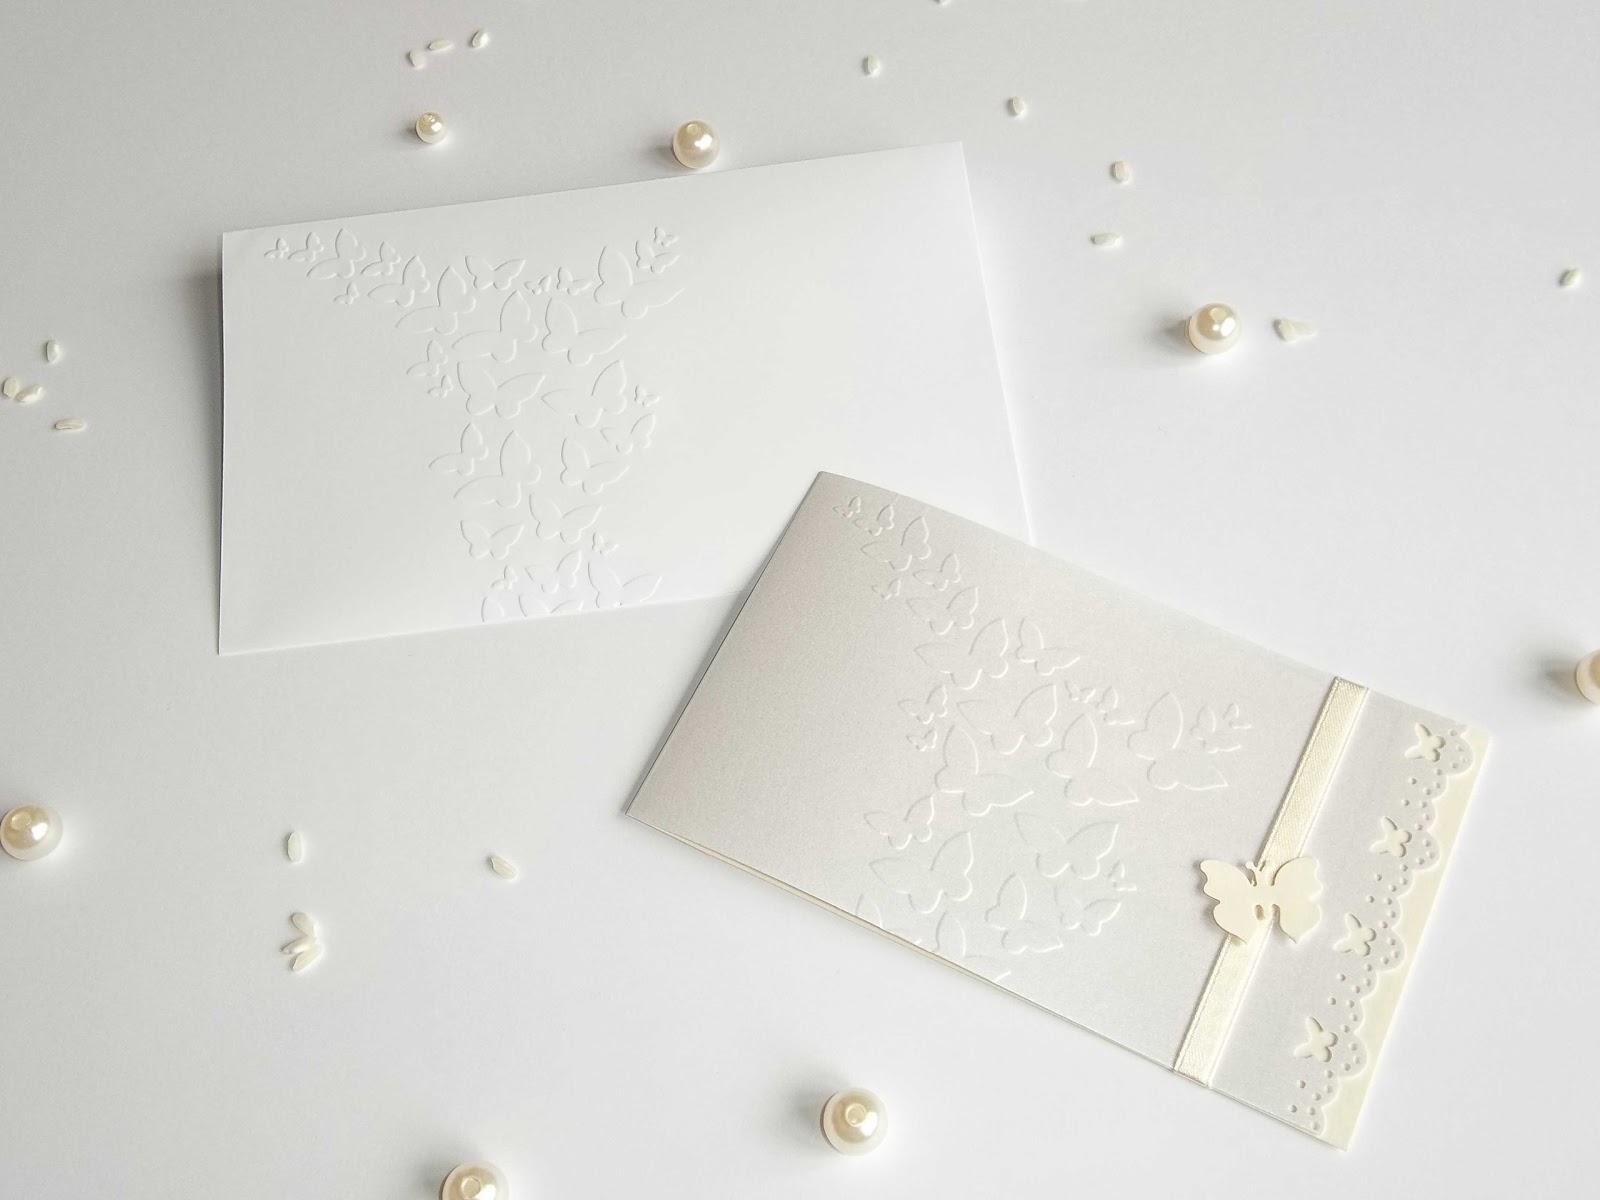 Sara crea partecipazioni eleganti per matrimonio e inviti for Inviti per matrimonio